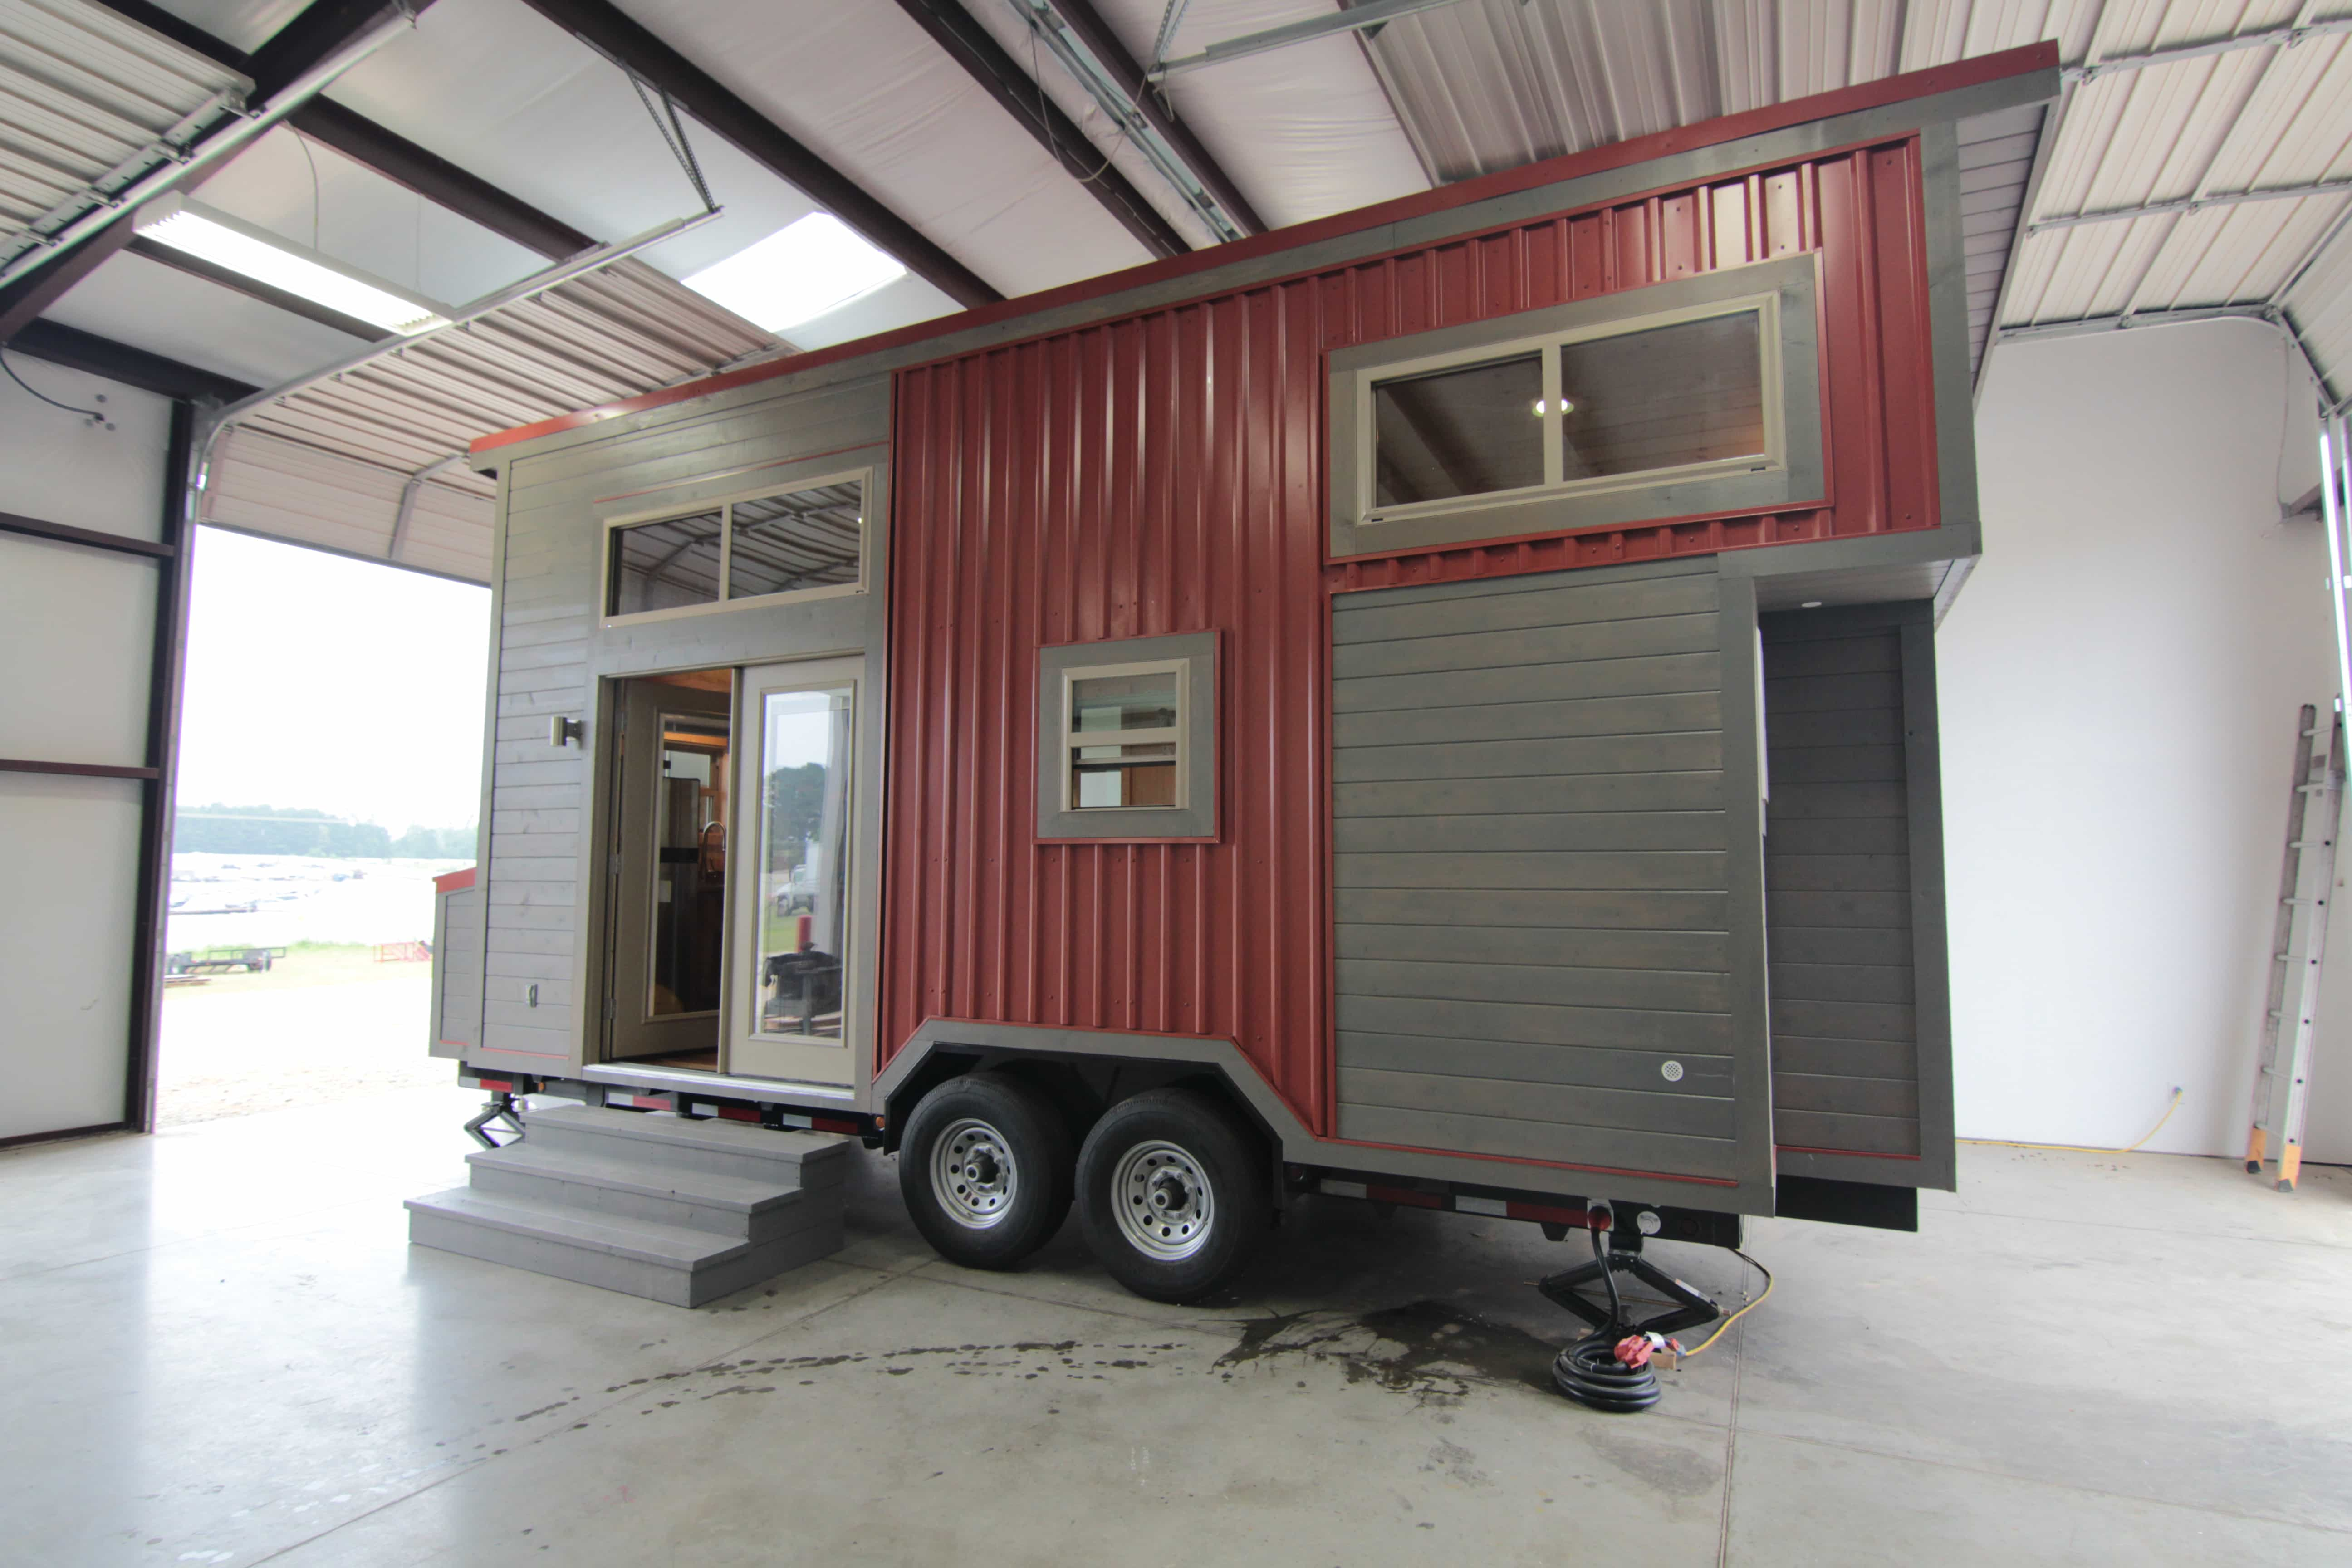 Houston American Tiny House Dream Model